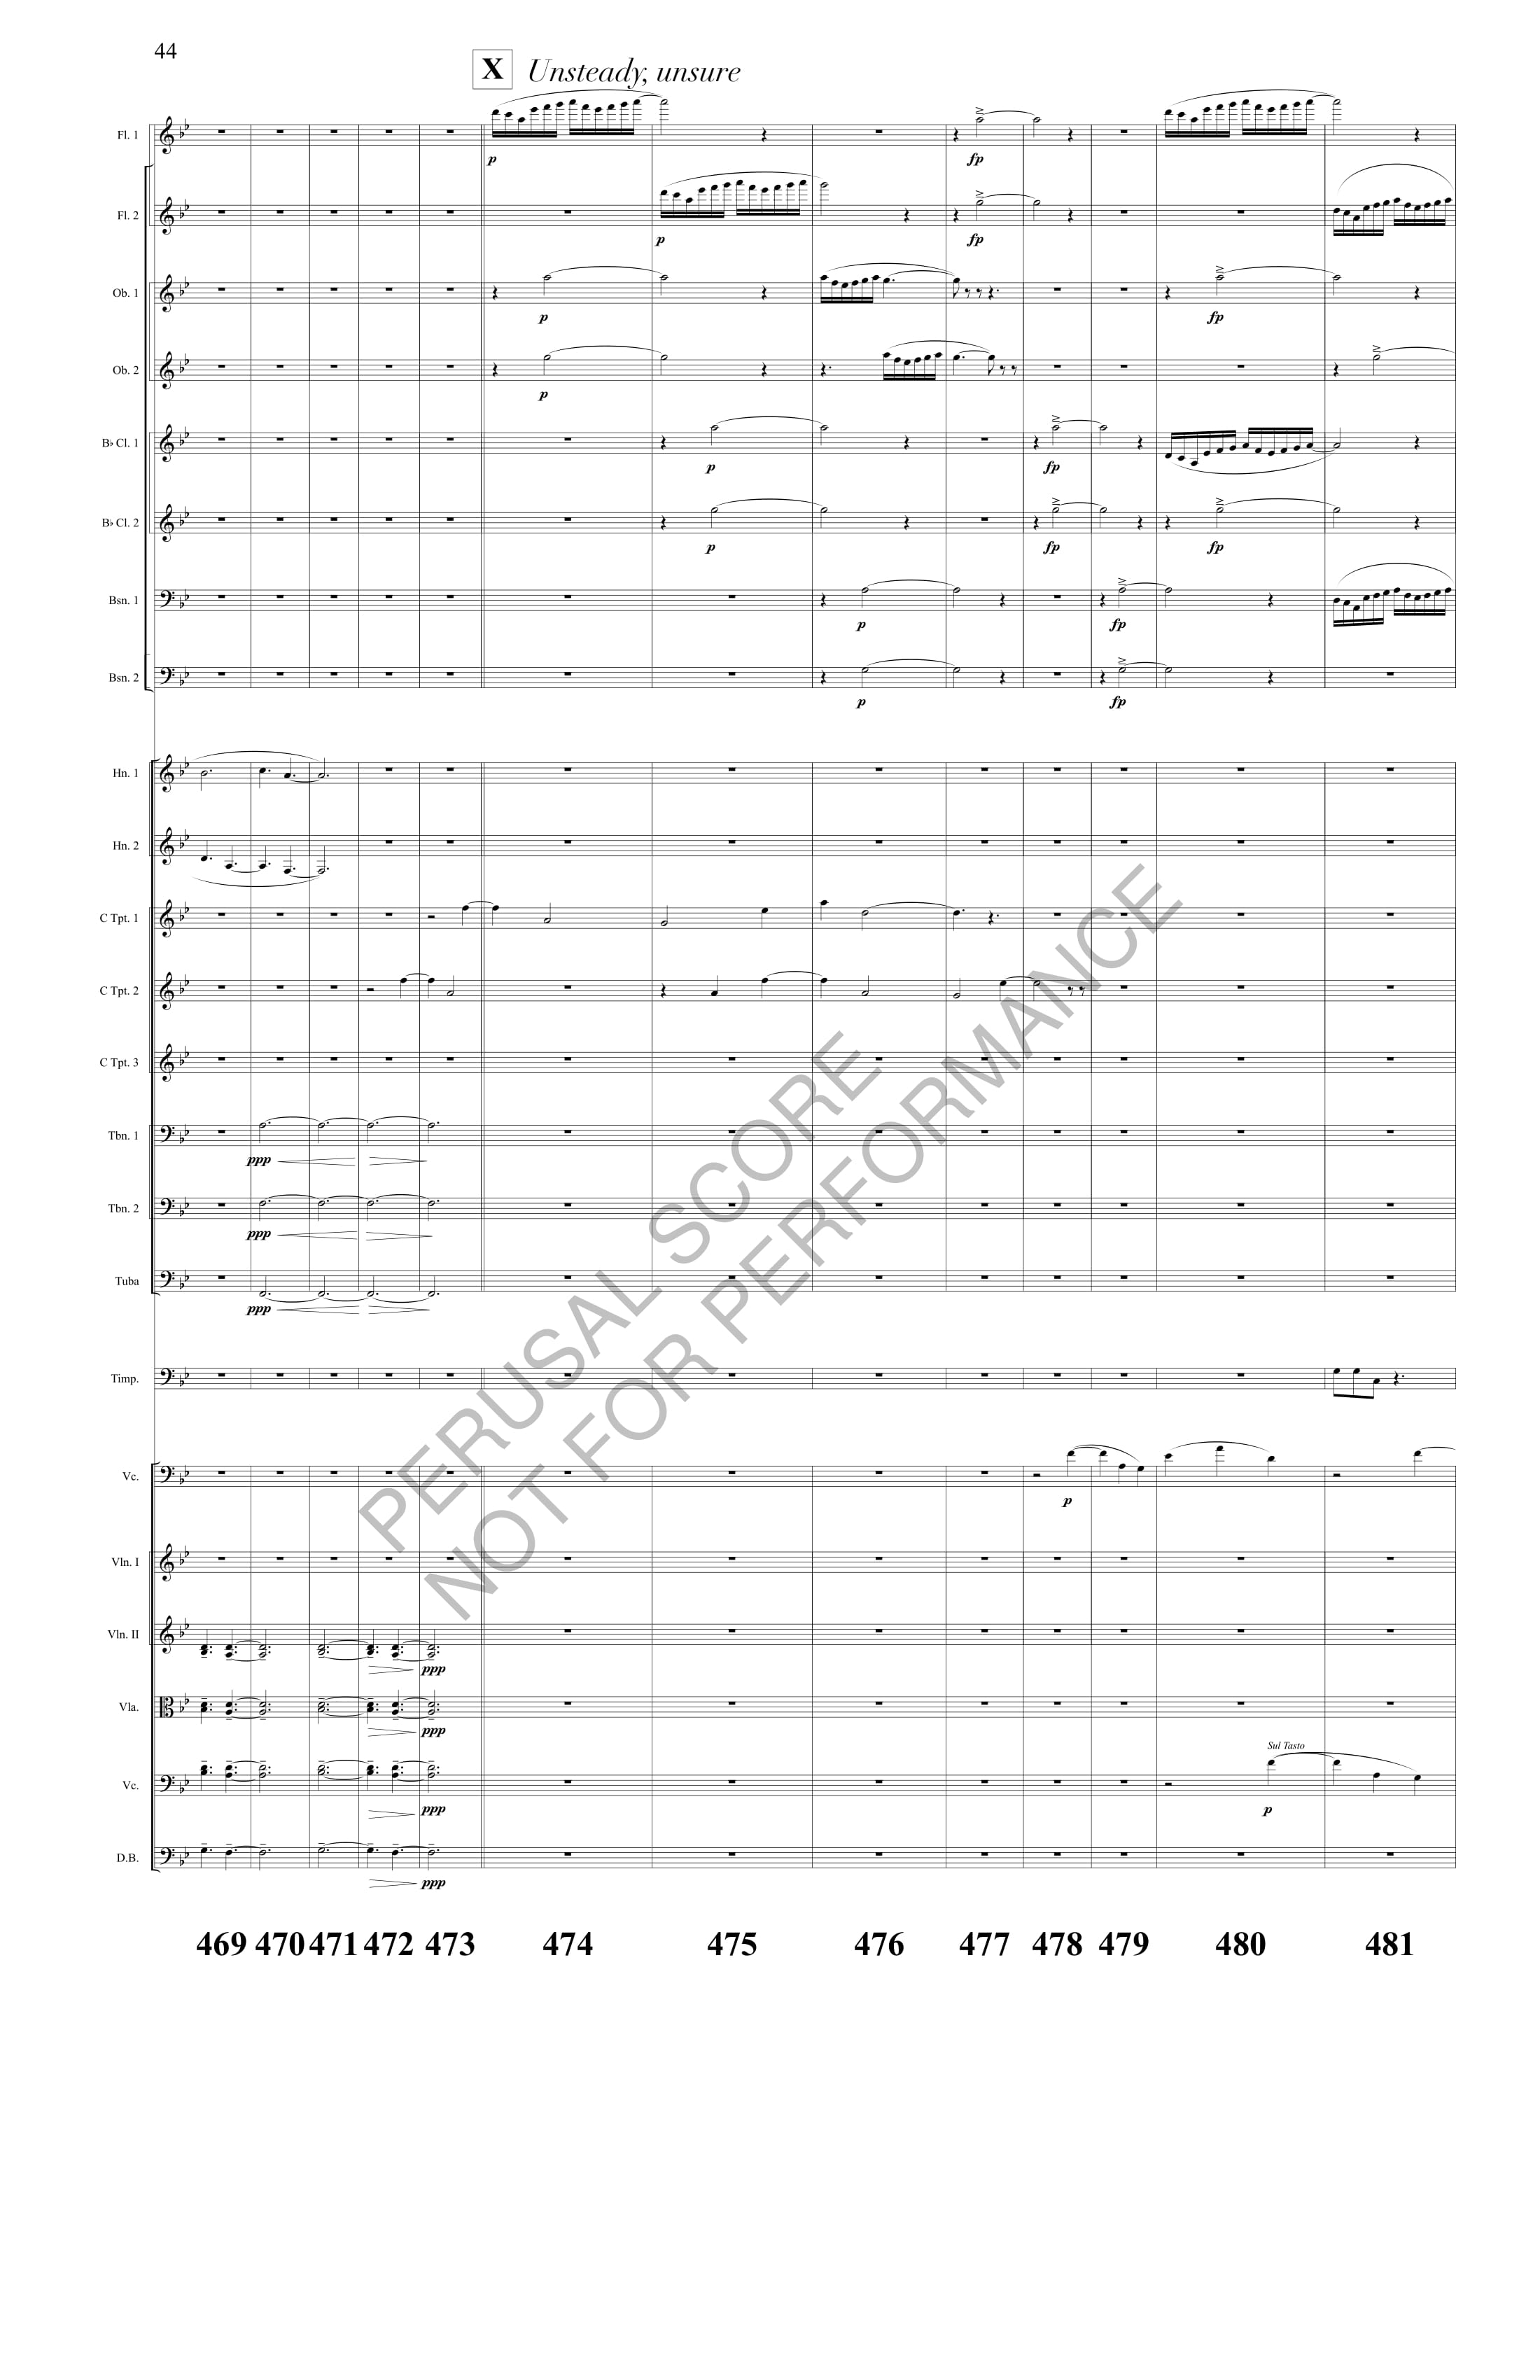 Boyd Tekton Score-watermark-50.jpg